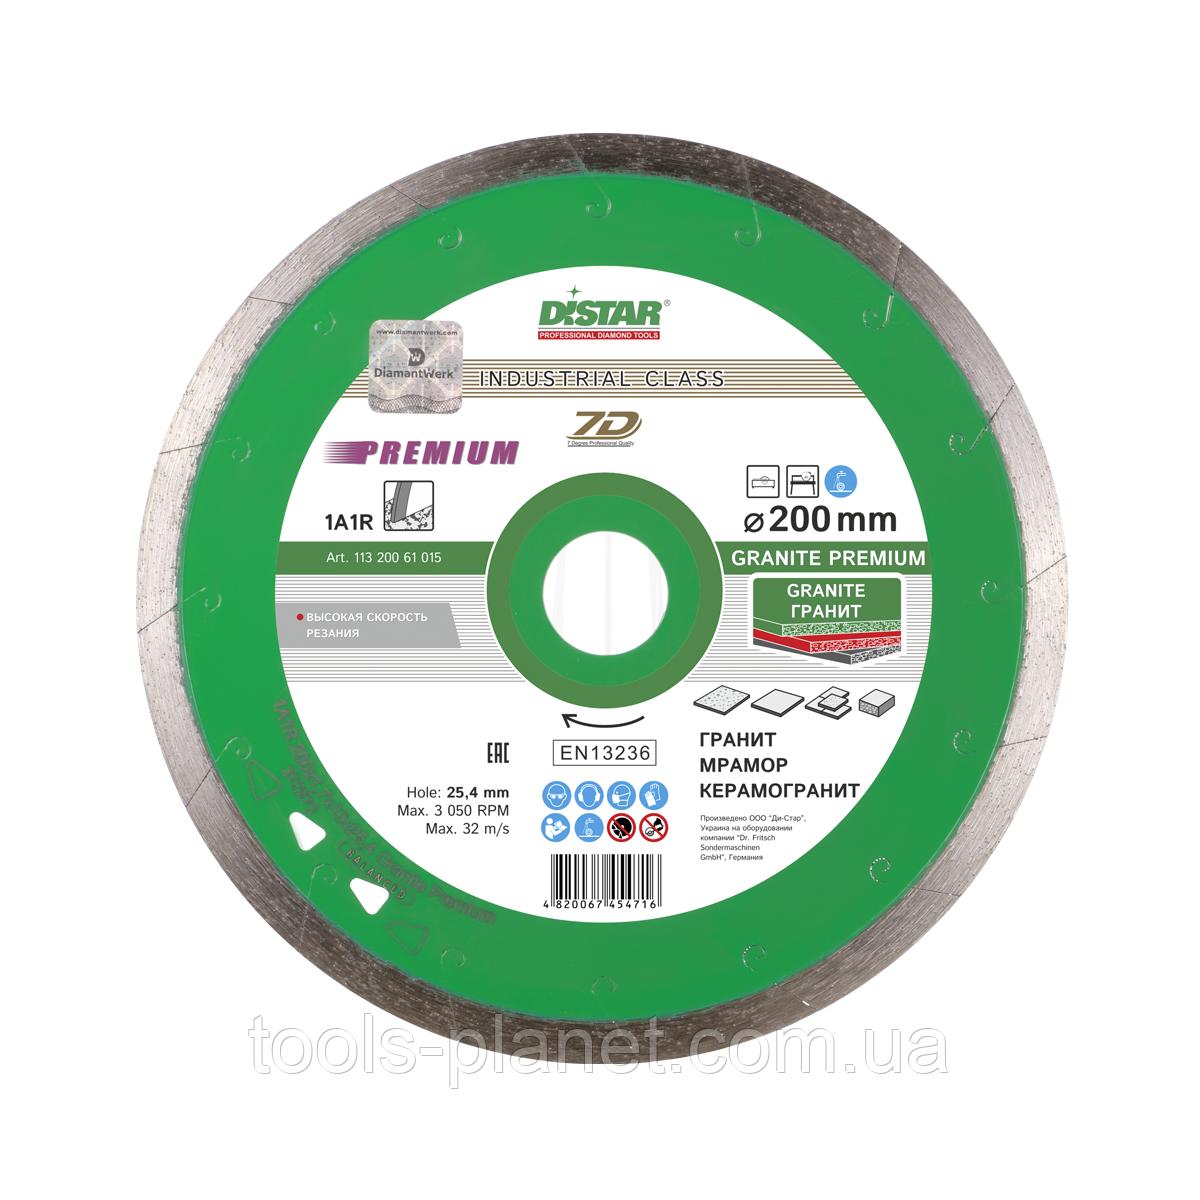 Алмазний диск Distar 1A1R 200 x 1,7 x 10 x 25,4 Granite Premium 7D (11320061015)